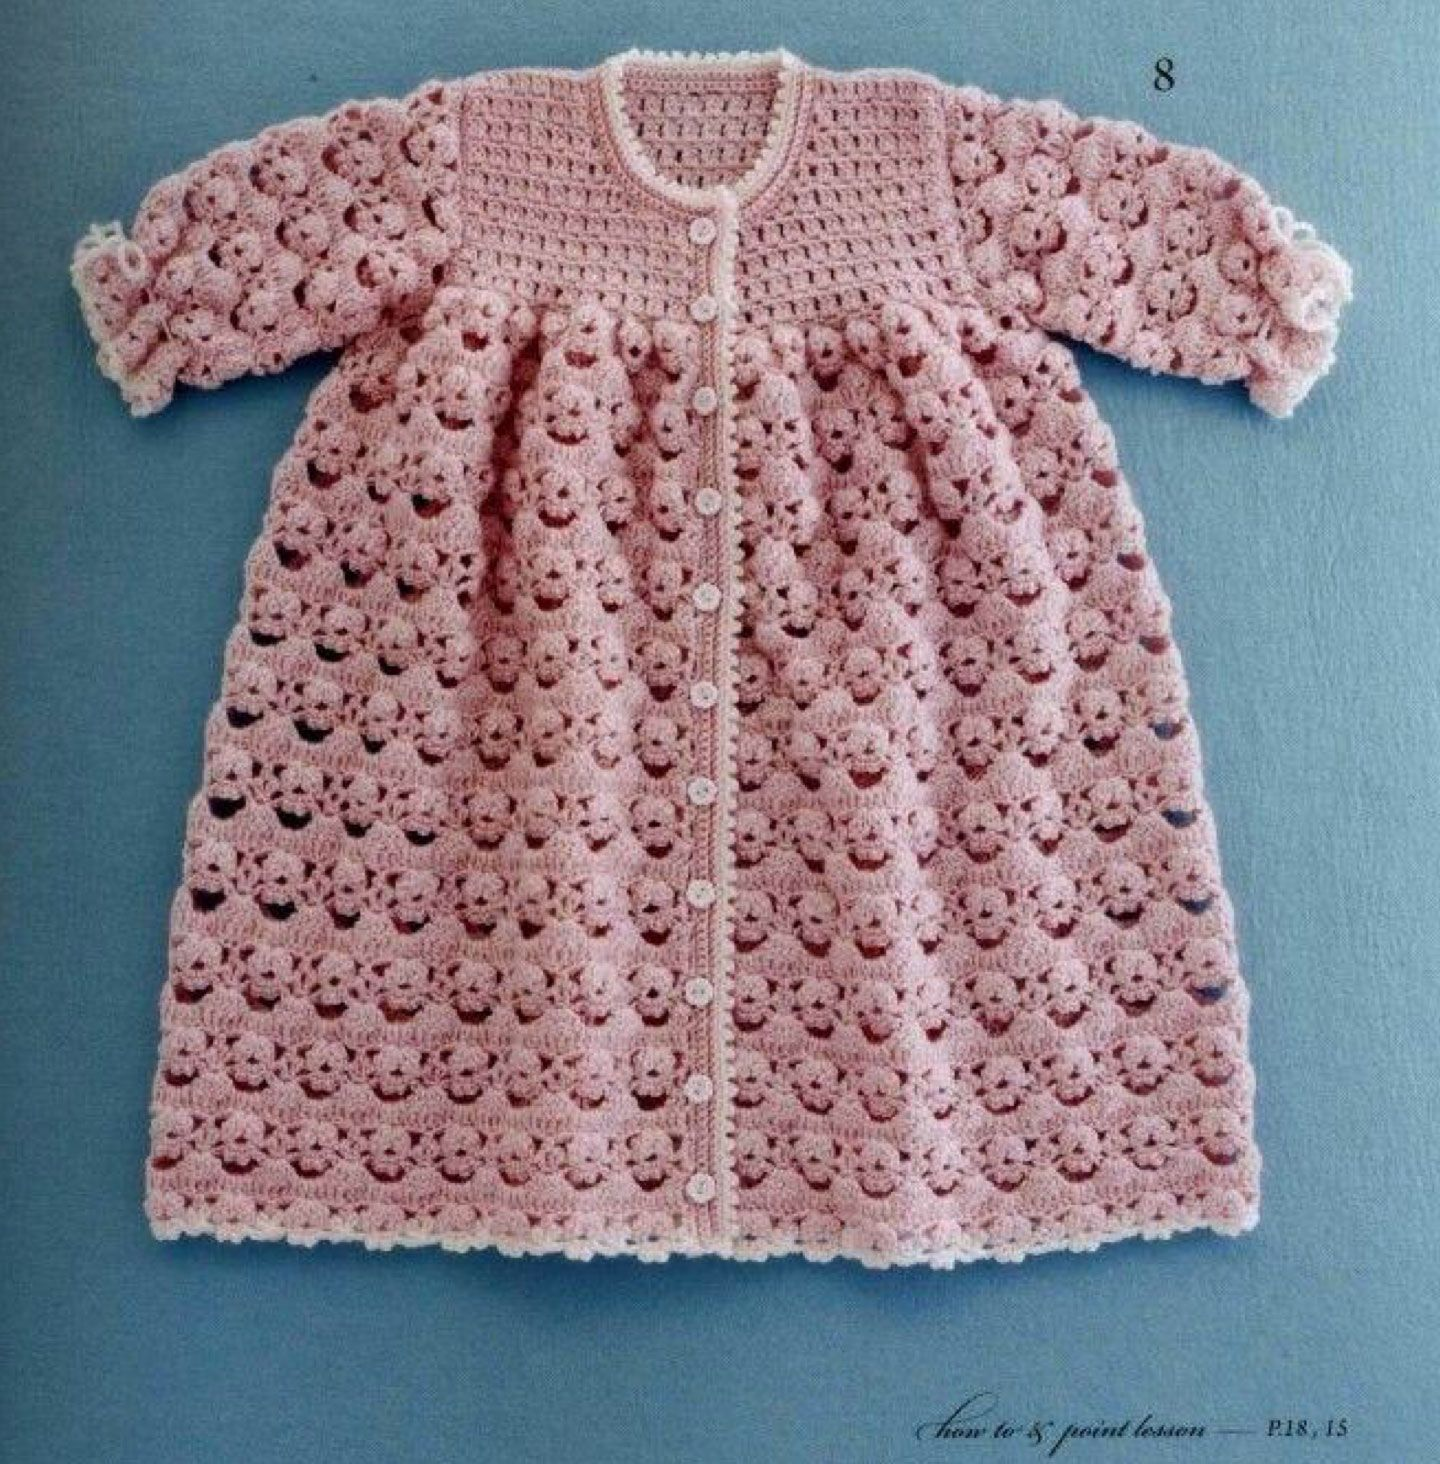 Beautiful Crochet Dress Pattern For Babies 0-12 months. More Great ...